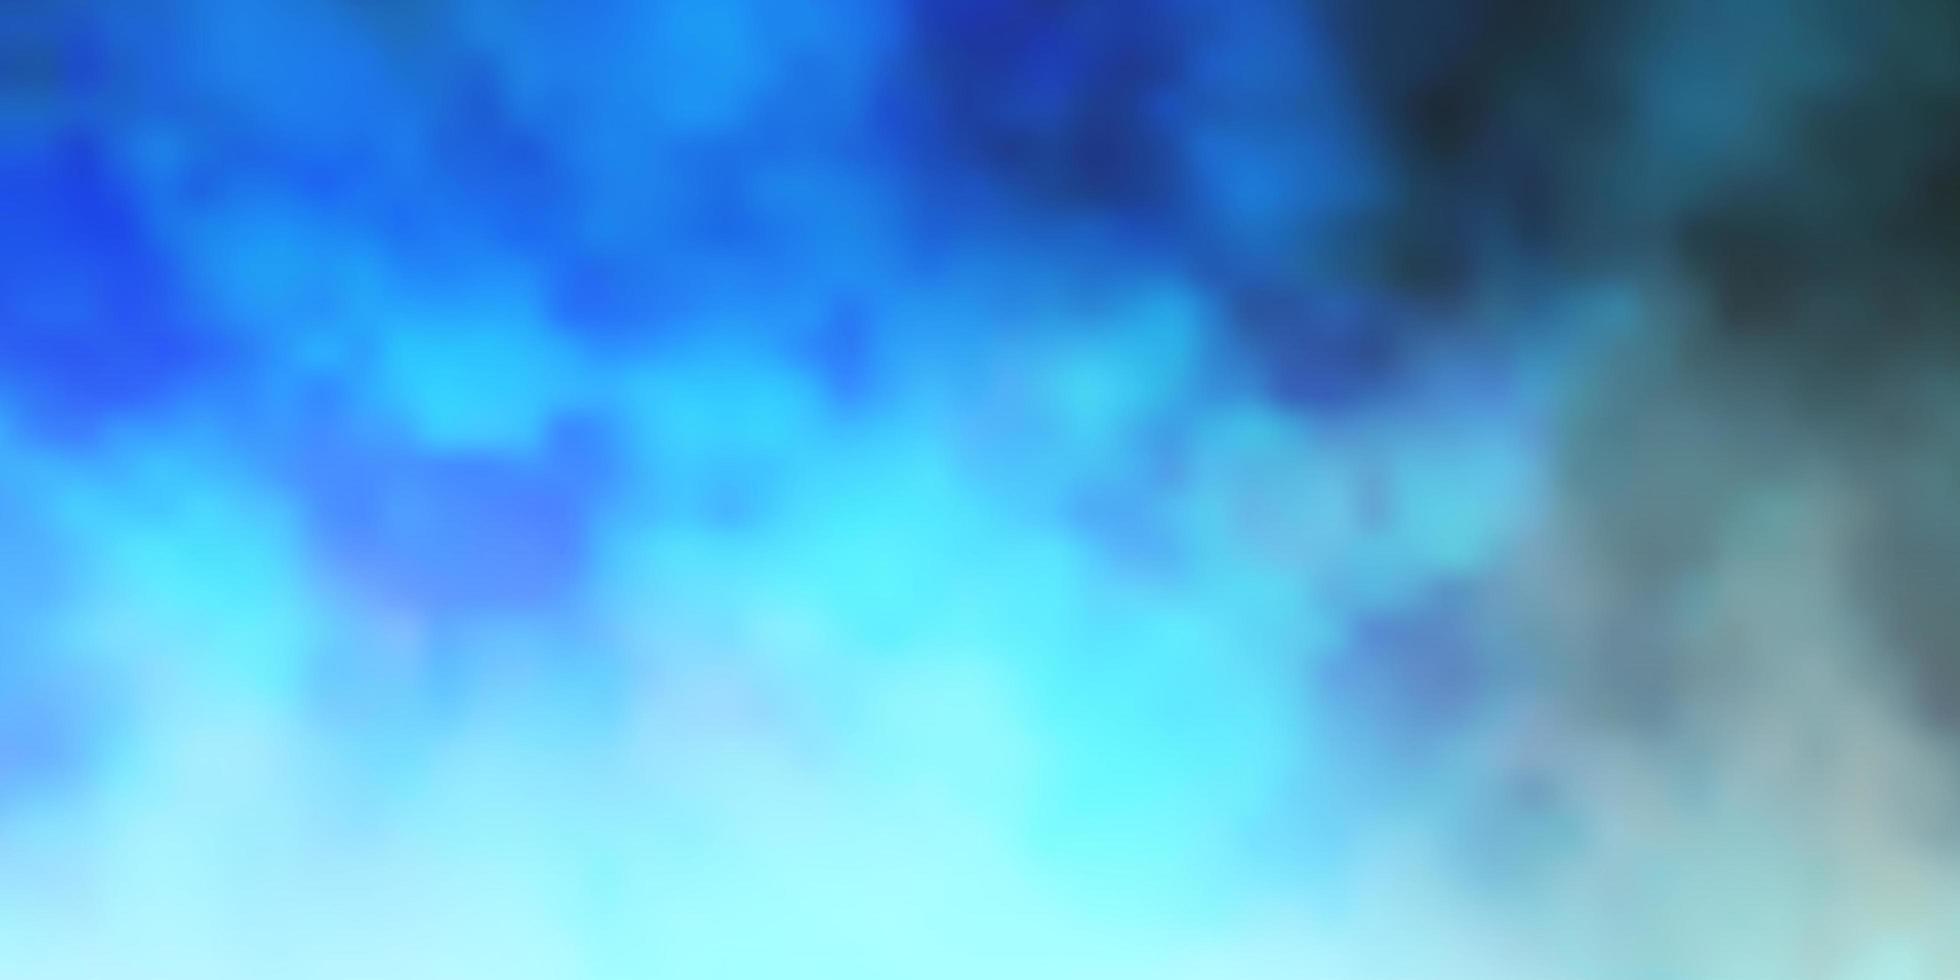 layout de vetor de azul escuro com cloudscape.